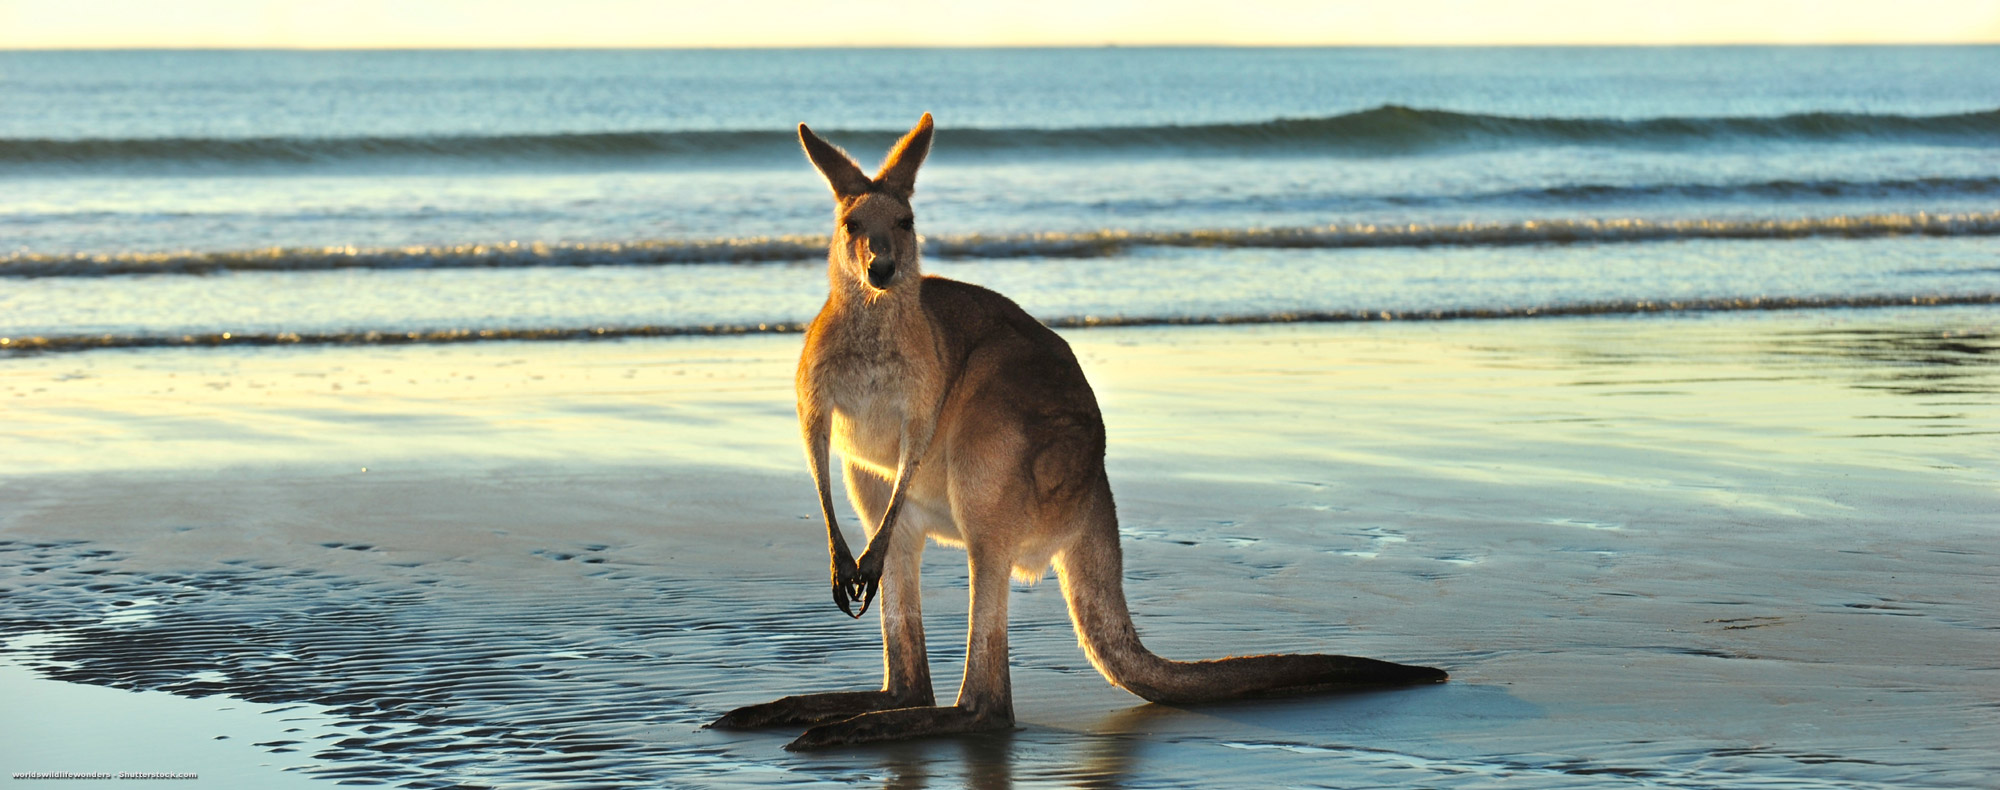 Sprachreise Melbourne